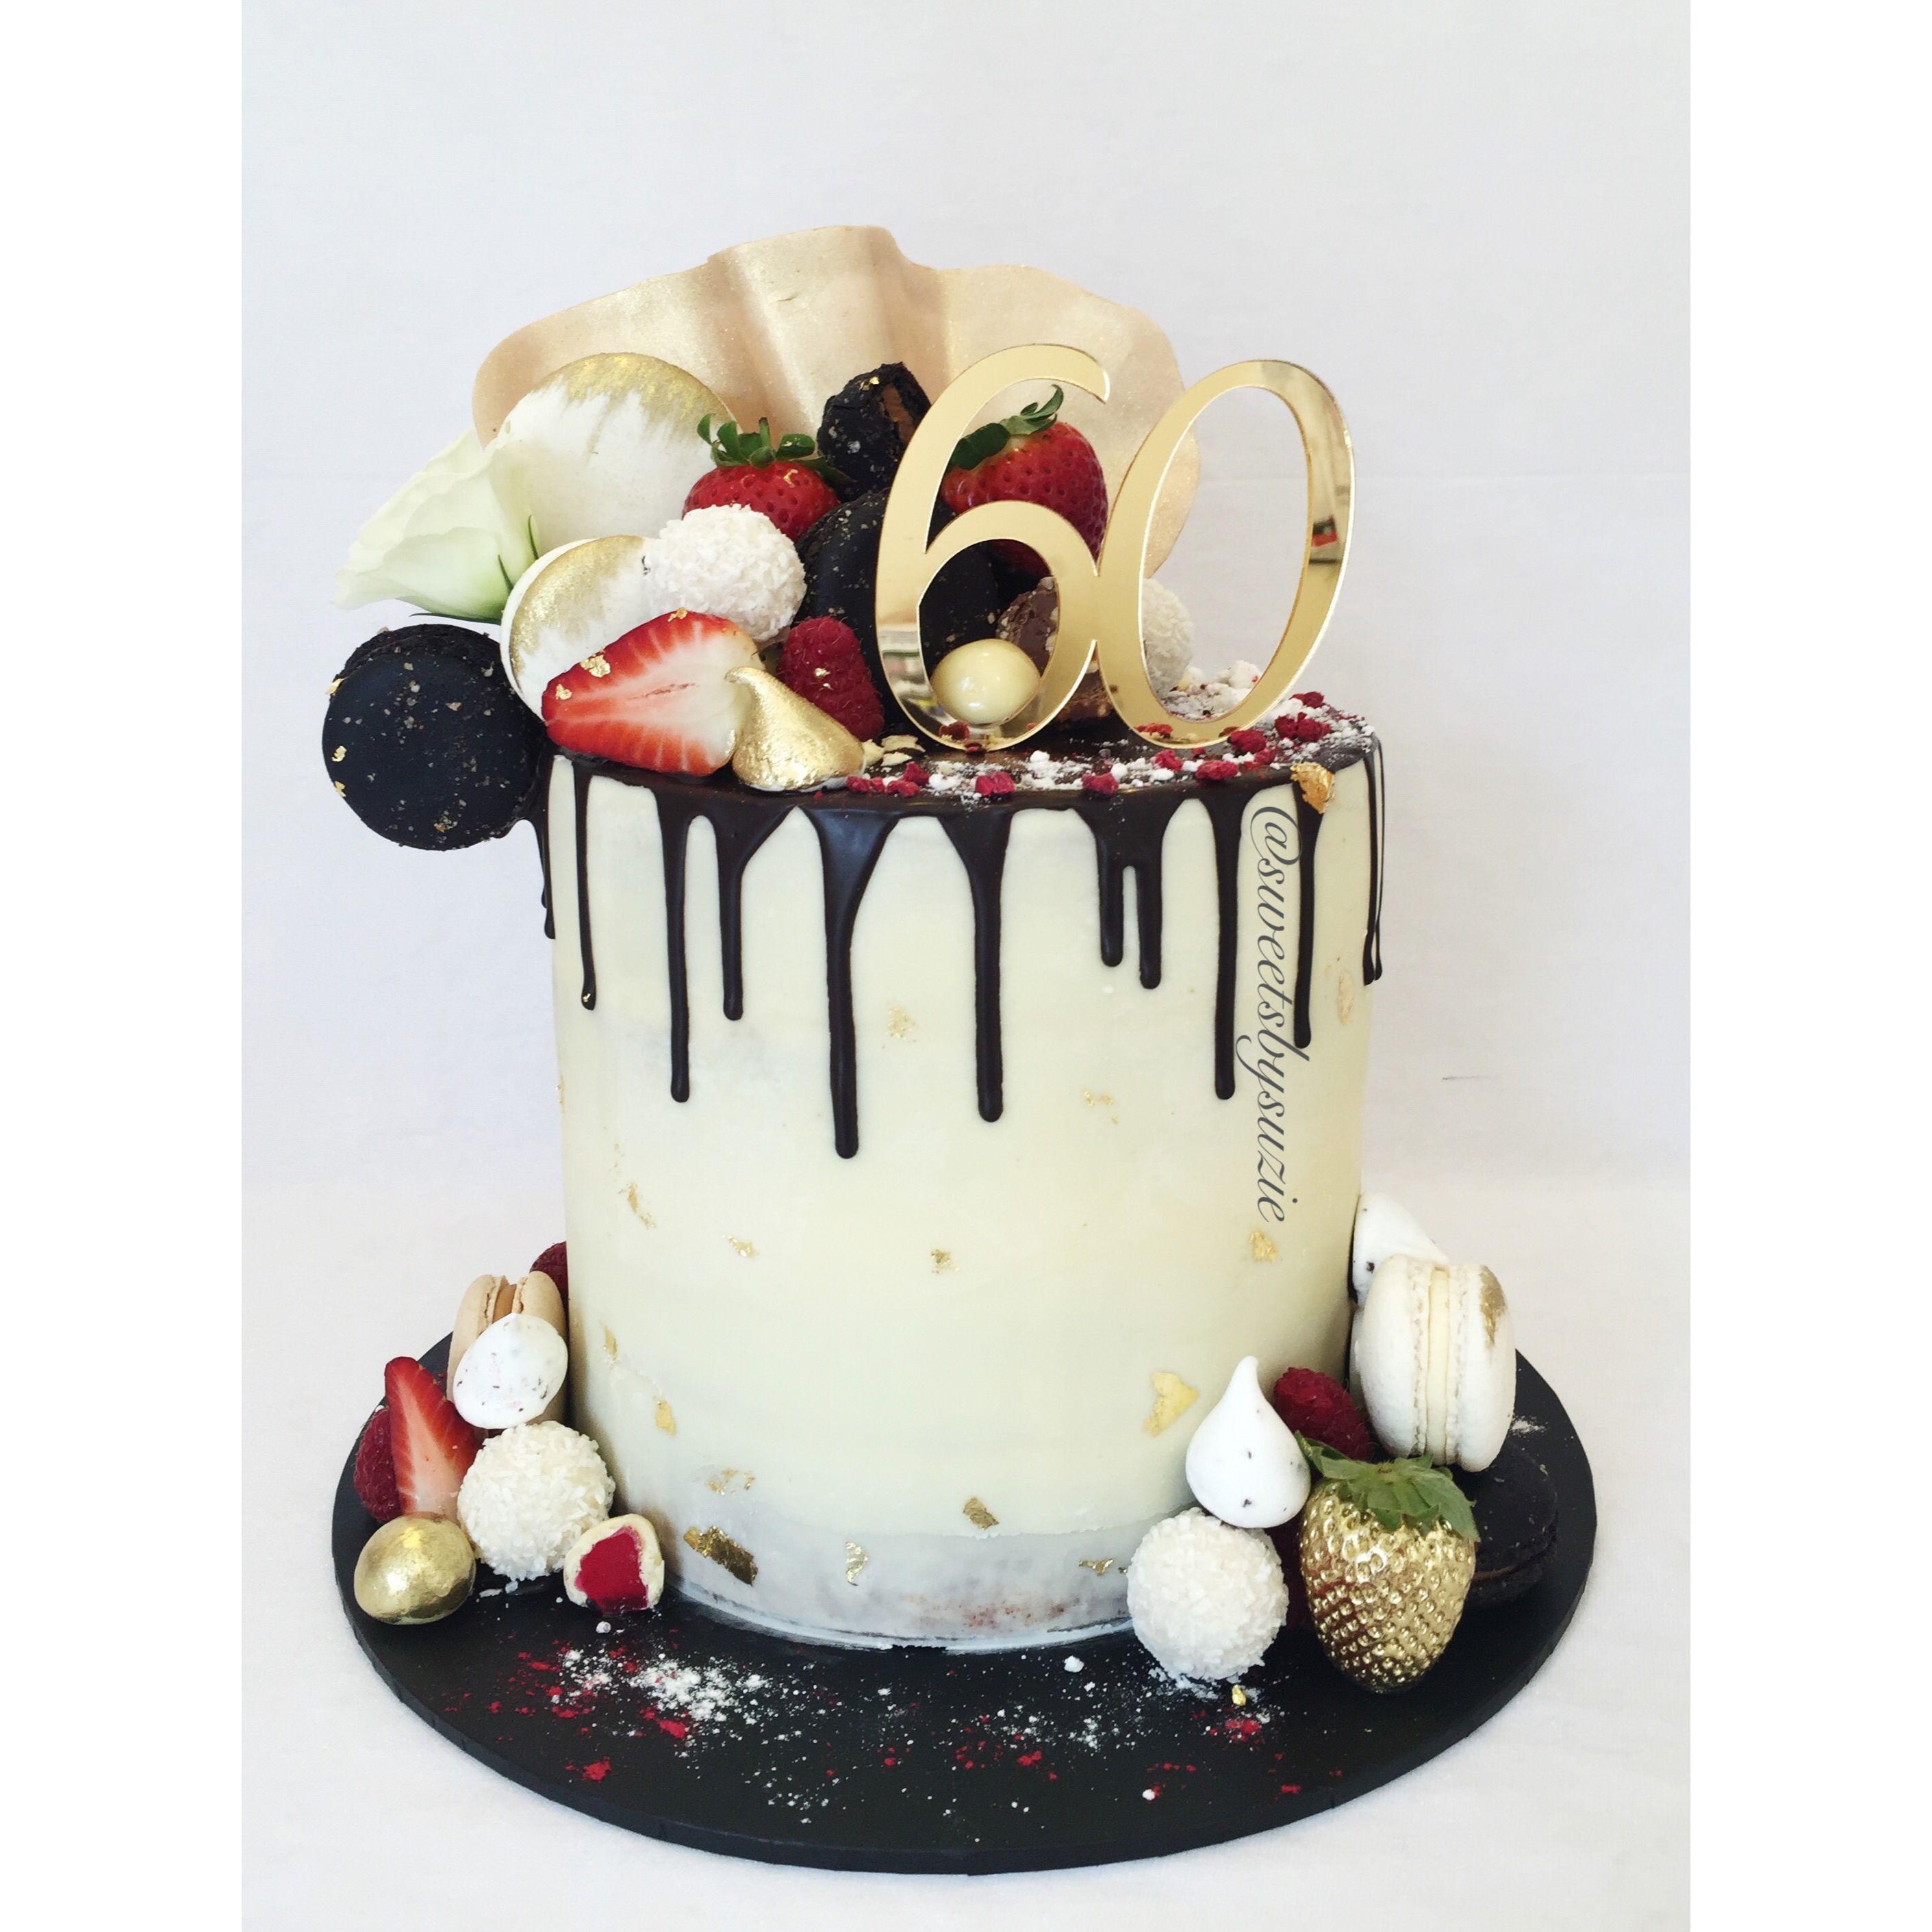 Birthday date ideas in Melbourne